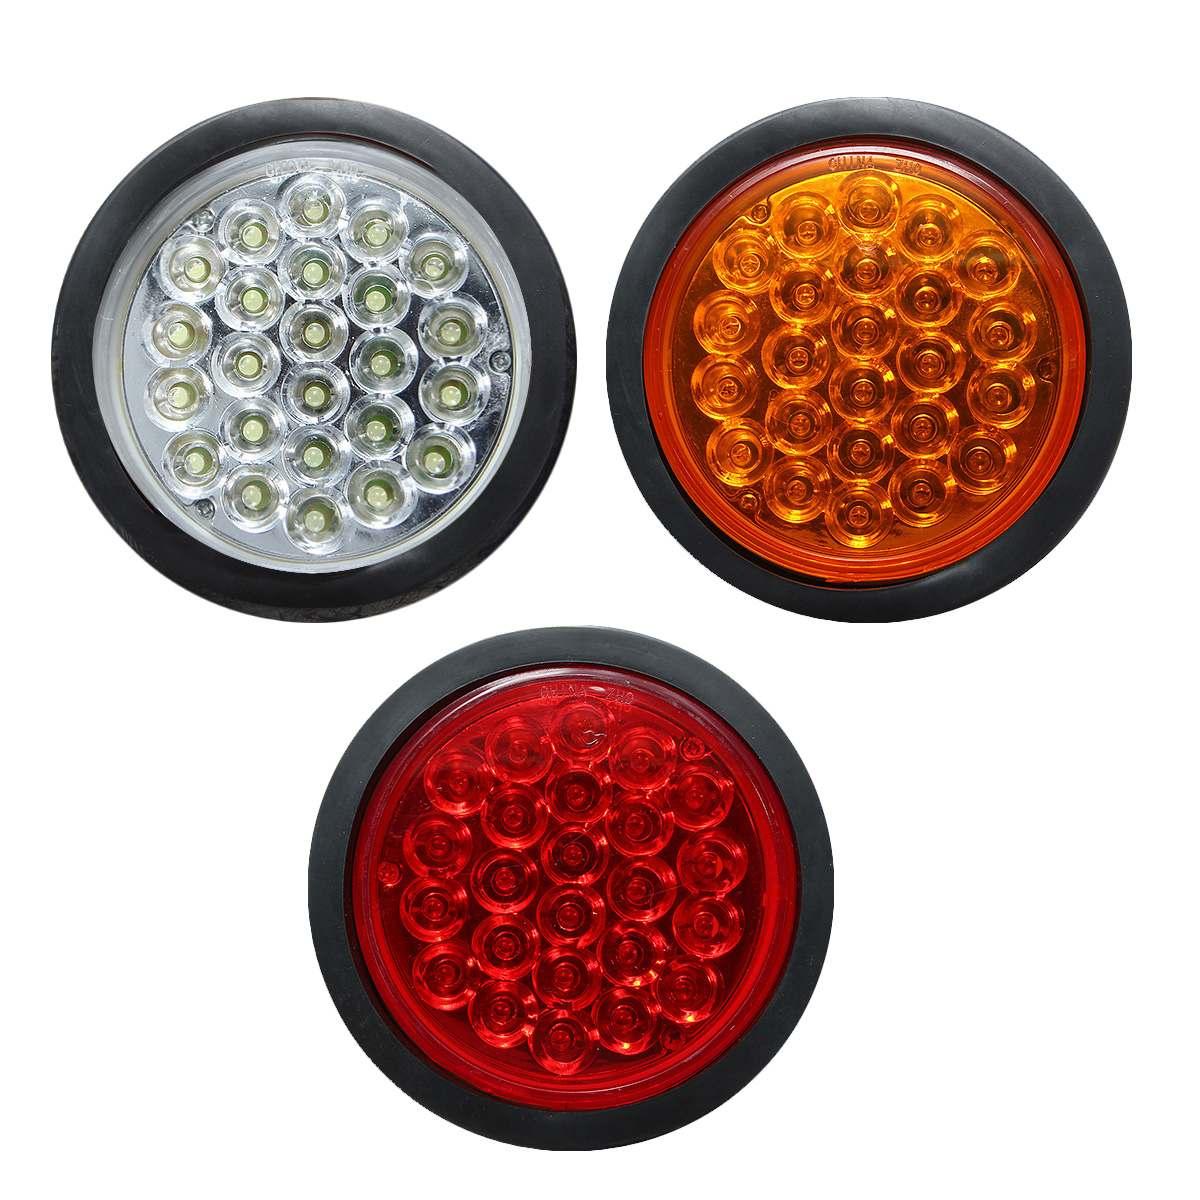 2 Round 2.5 Red Trailer Marker Lights With Brackets